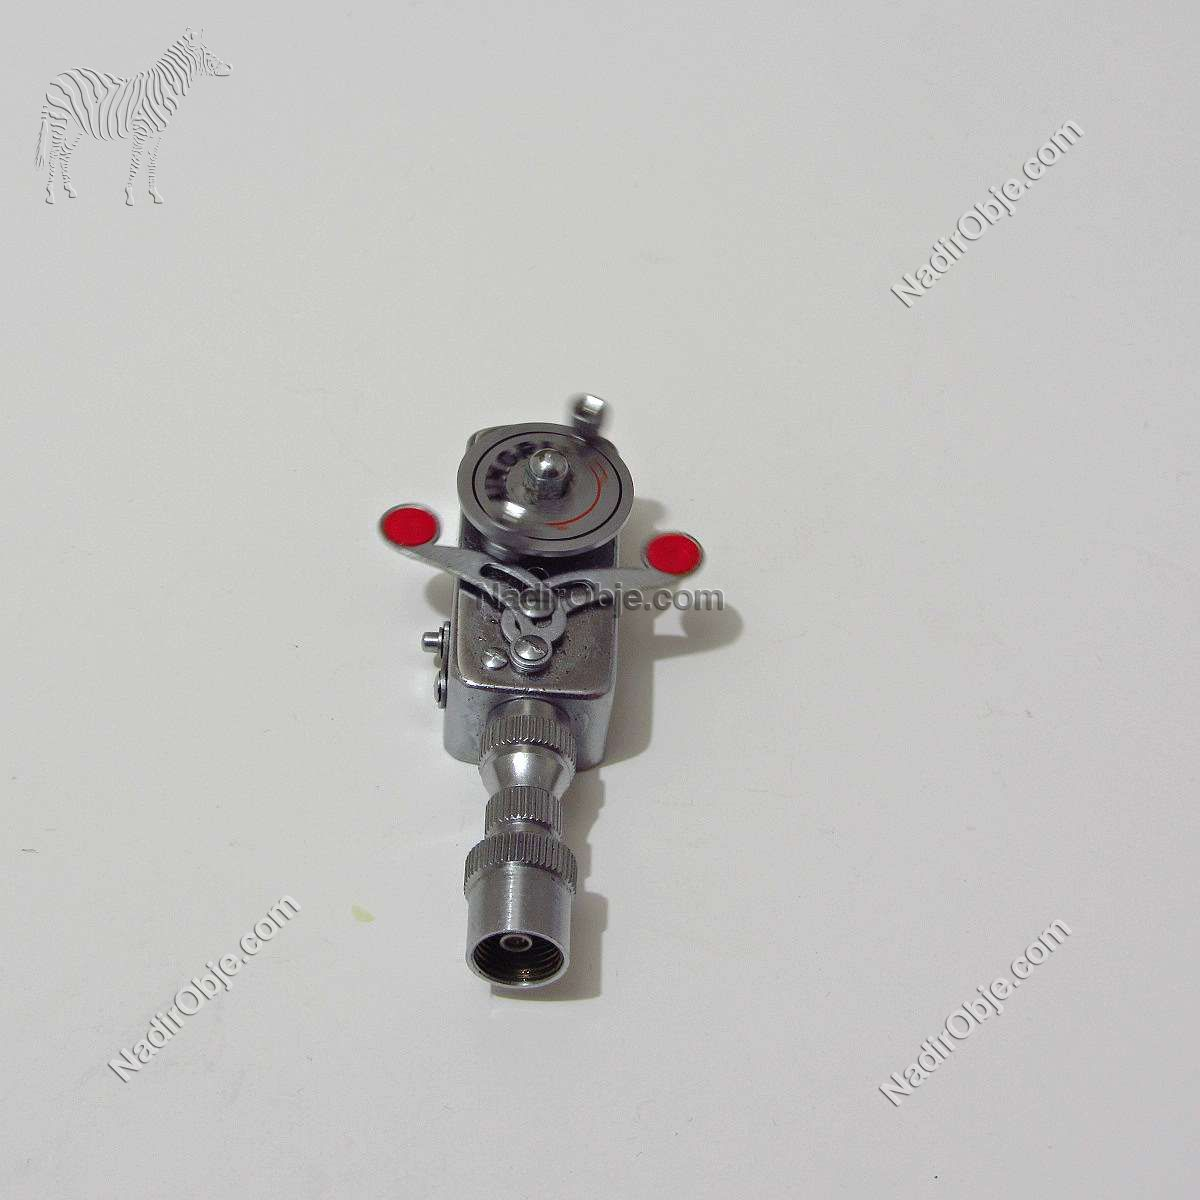 MINORI Self Timer – N2116 Mekanik-Elektrikli Objeler Fotoğraf